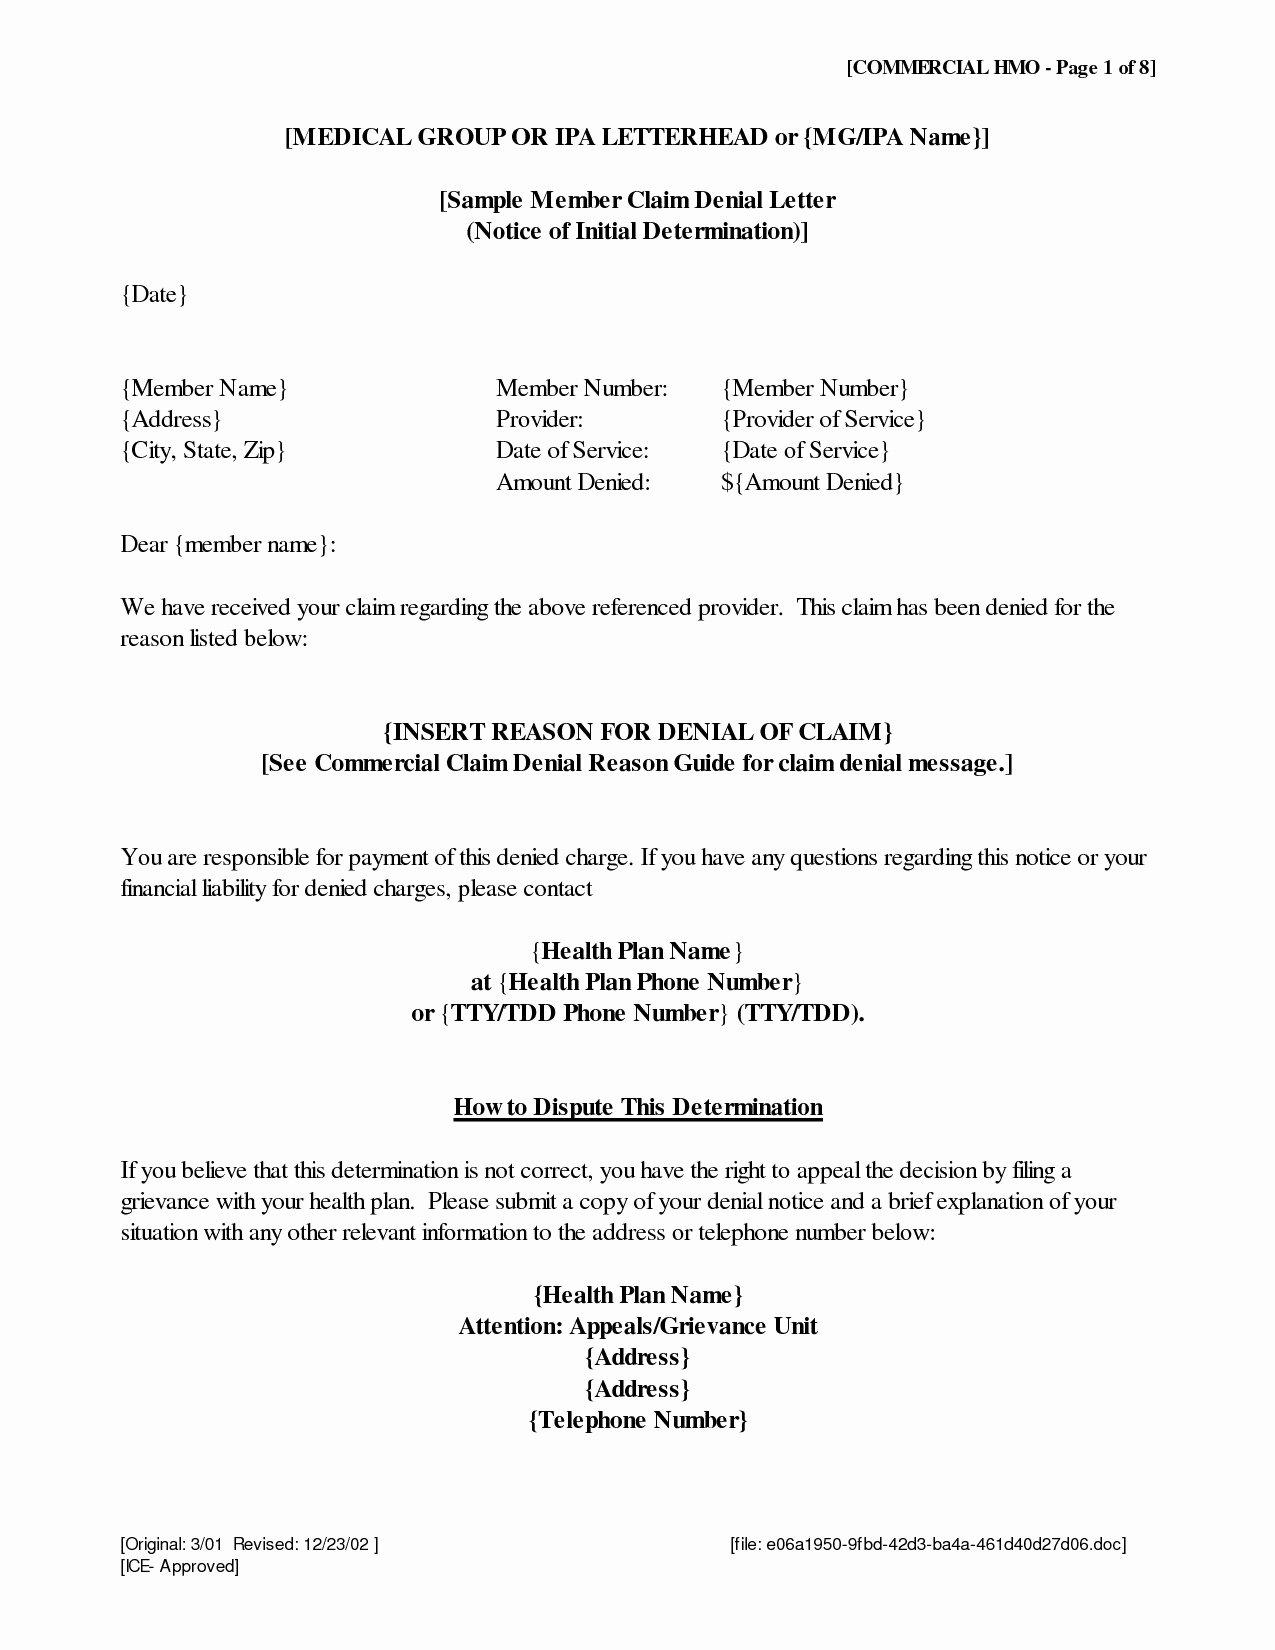 Claim Denial Letter Template Unique Insurance Denial Letter Template Samples